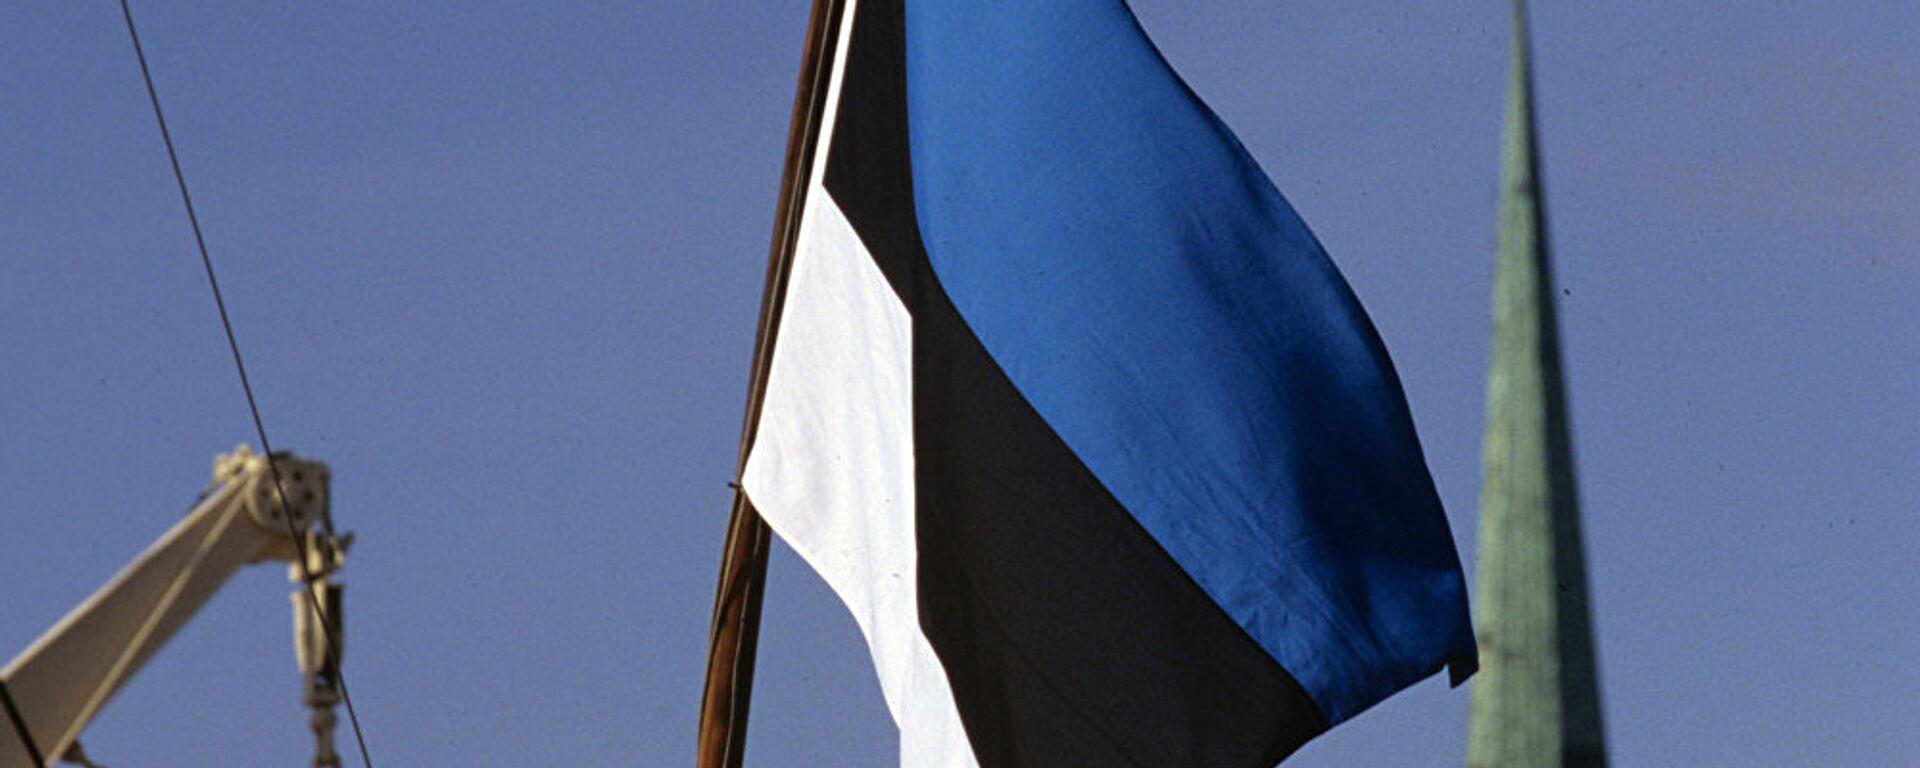 Igaunijas karogs - Sputnik Latvija, 1920, 03.09.2021